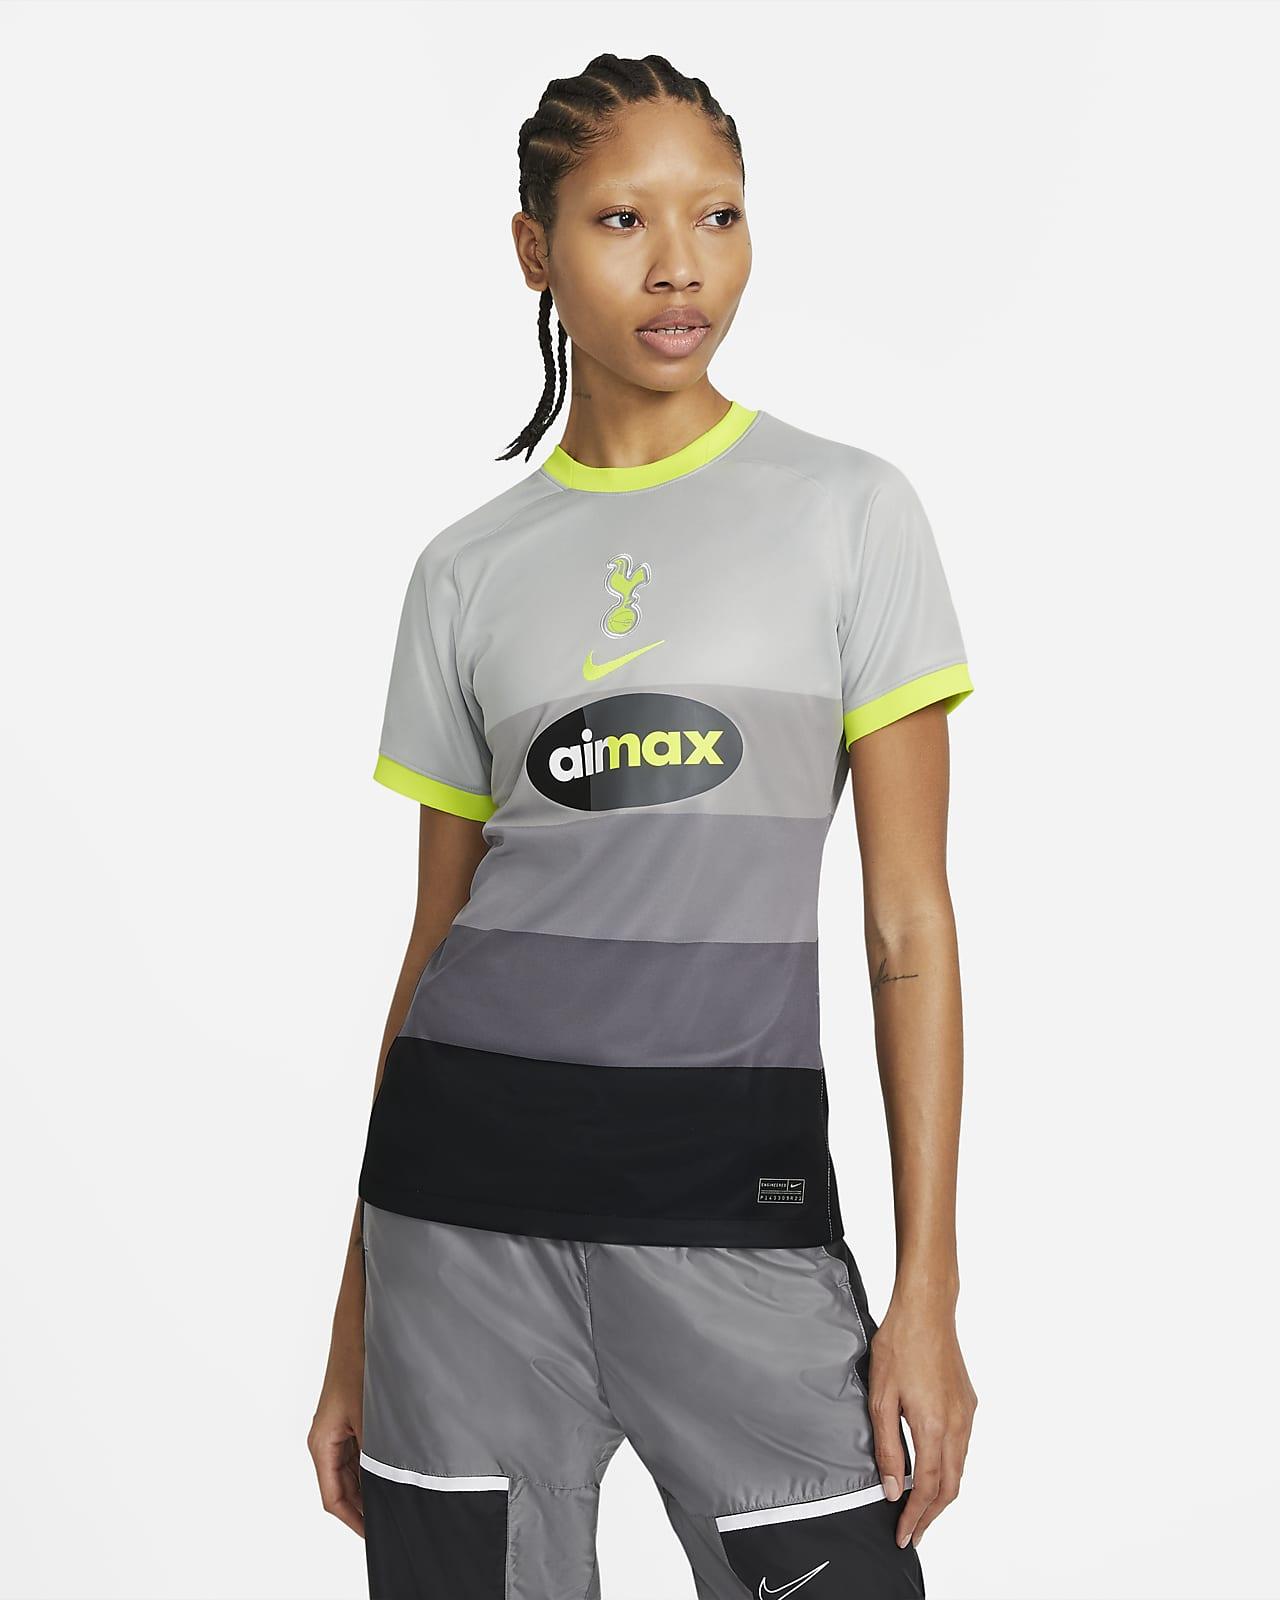 Tottenham Hotspur Stadium Air Max Women's Football Shirt